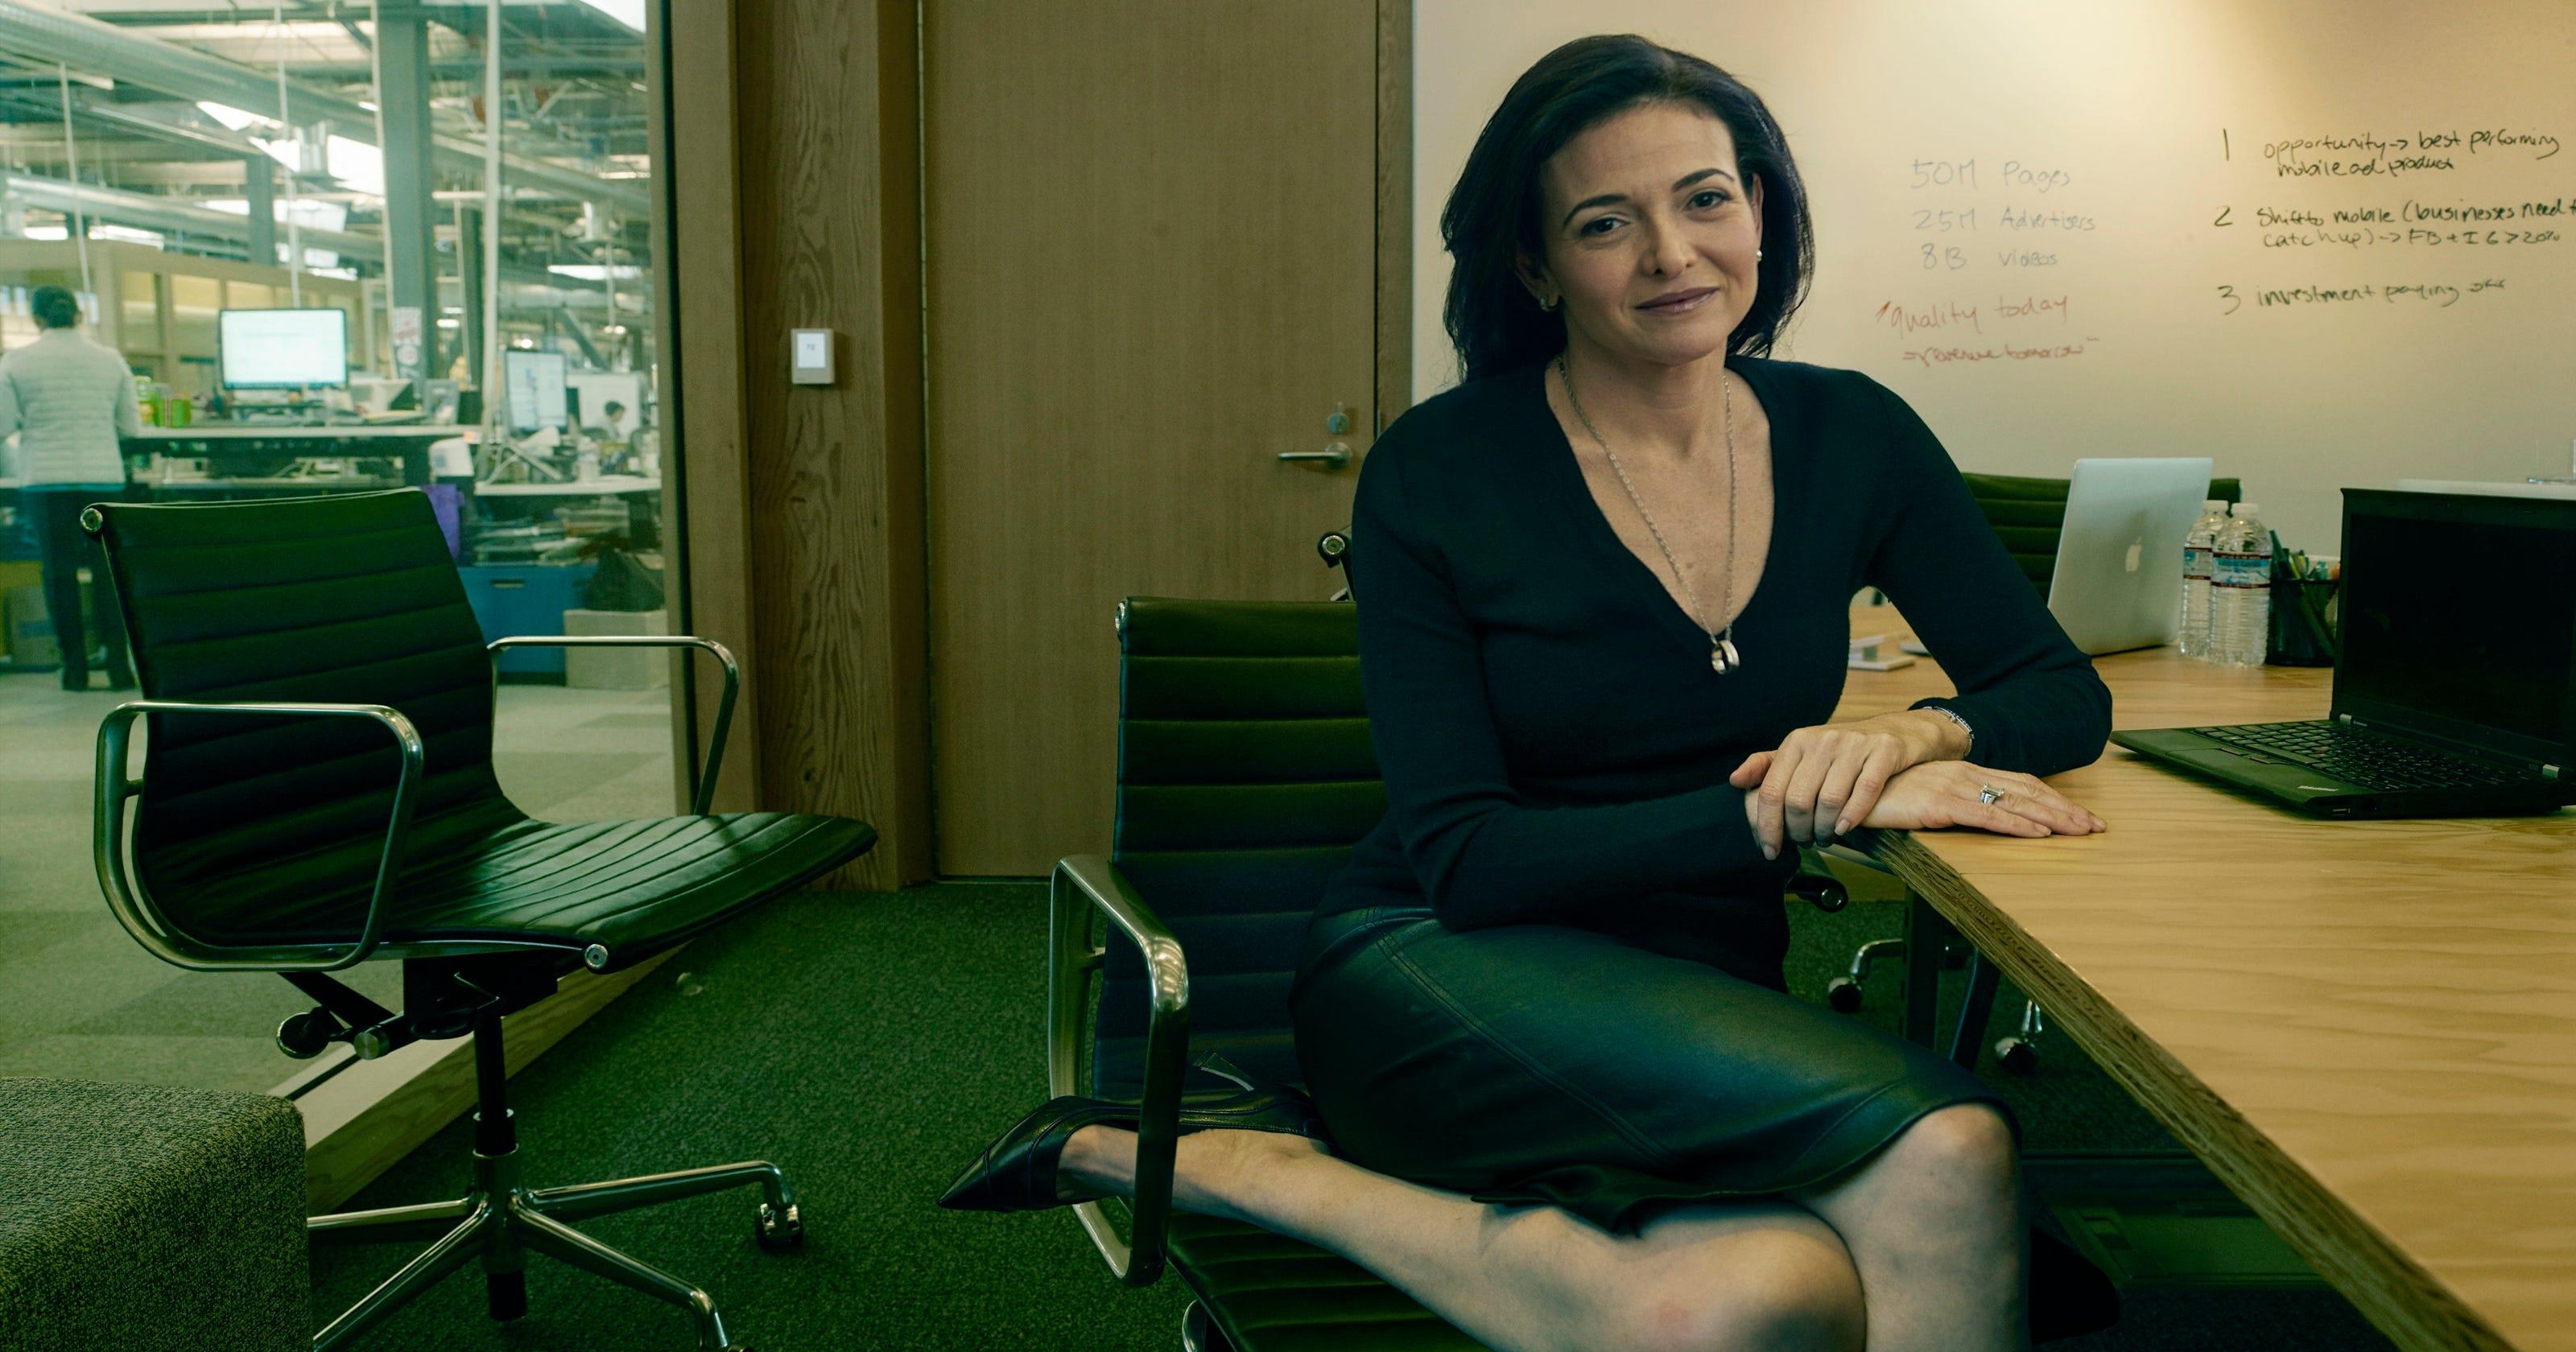 Sheryl Sandberg: Hard to lean in as single mom